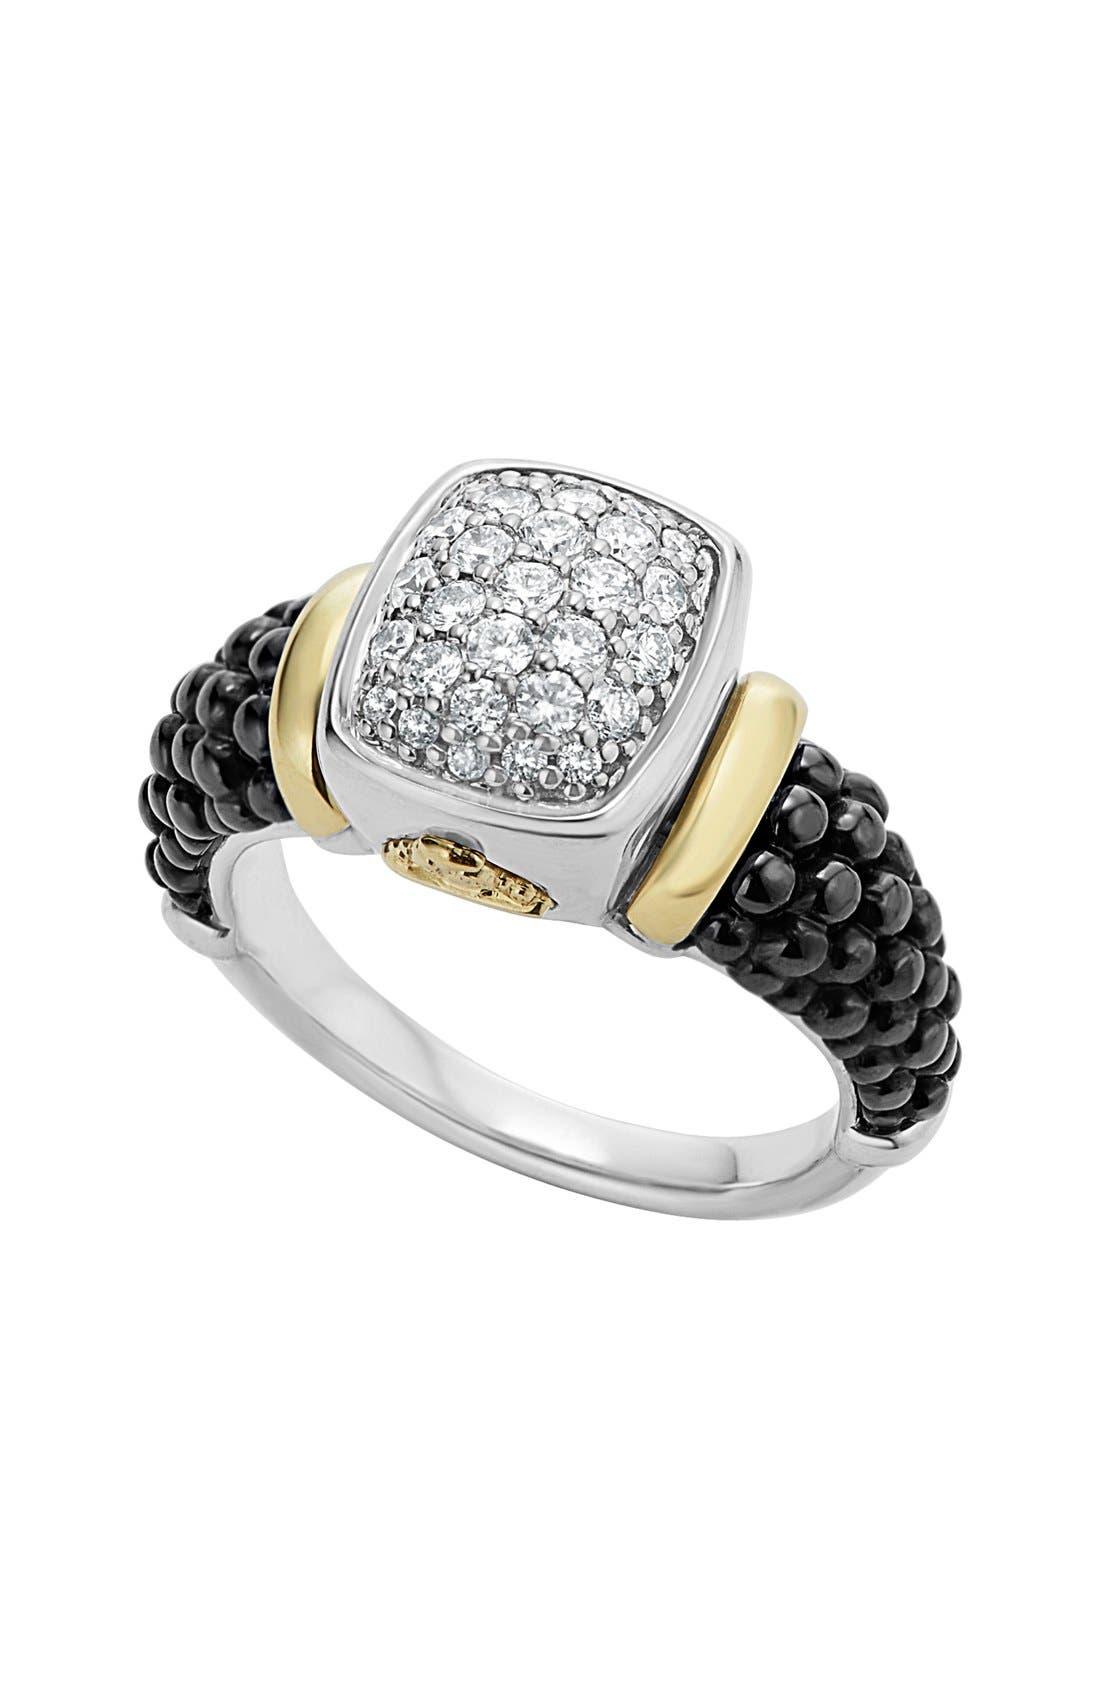 'Caviar' Diamond Ring,                             Main thumbnail 1, color,                             BLACK/ GOLD